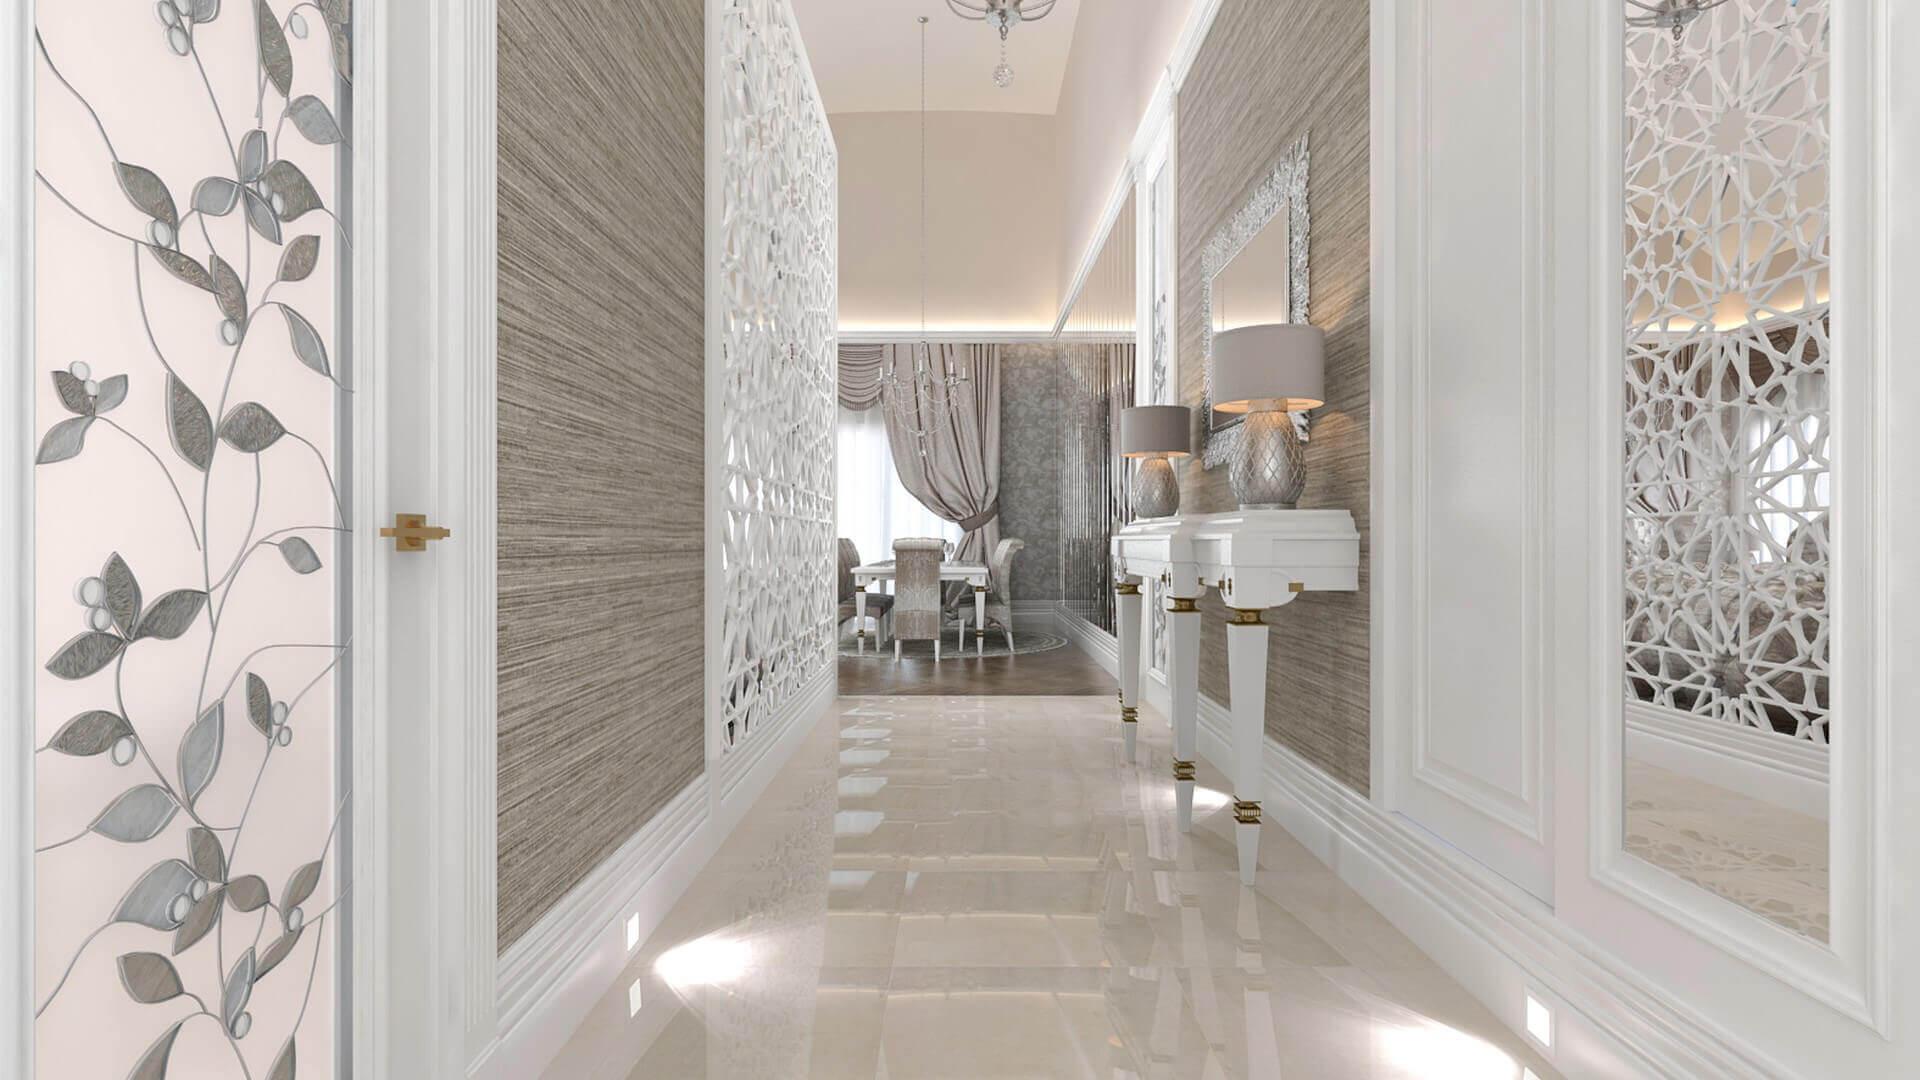 Sinpaş Altınoran 3289 S. Aslan Flat Residential